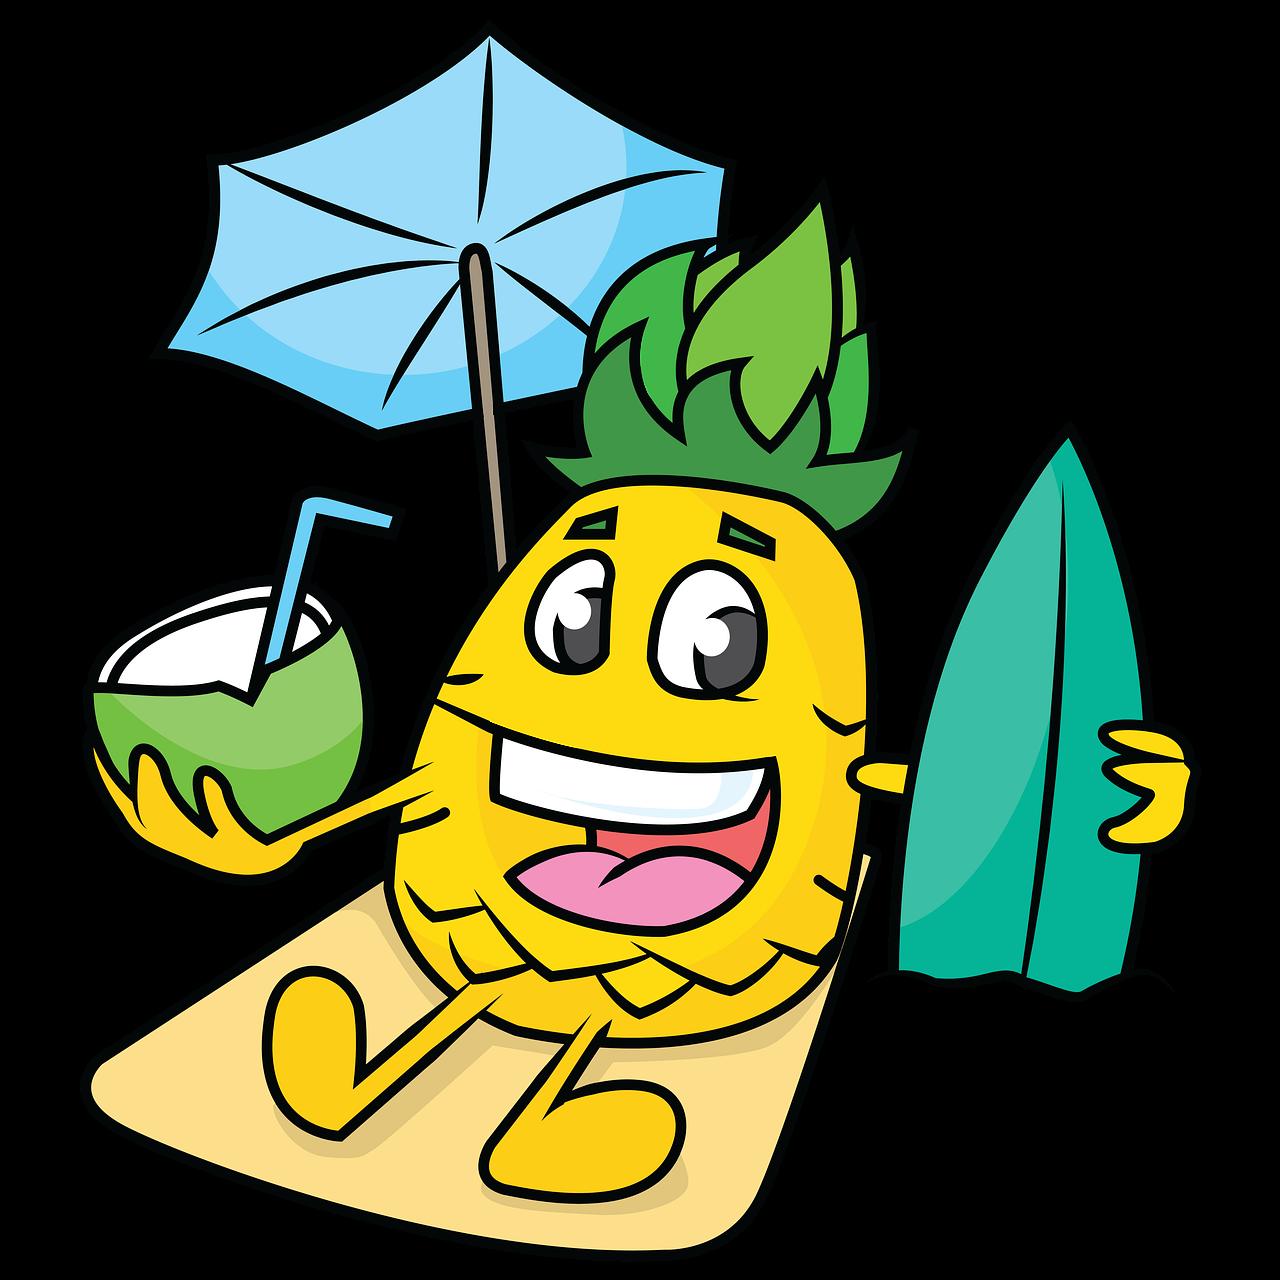 Beach Pineapple Cartoons Free Image On Pixabay